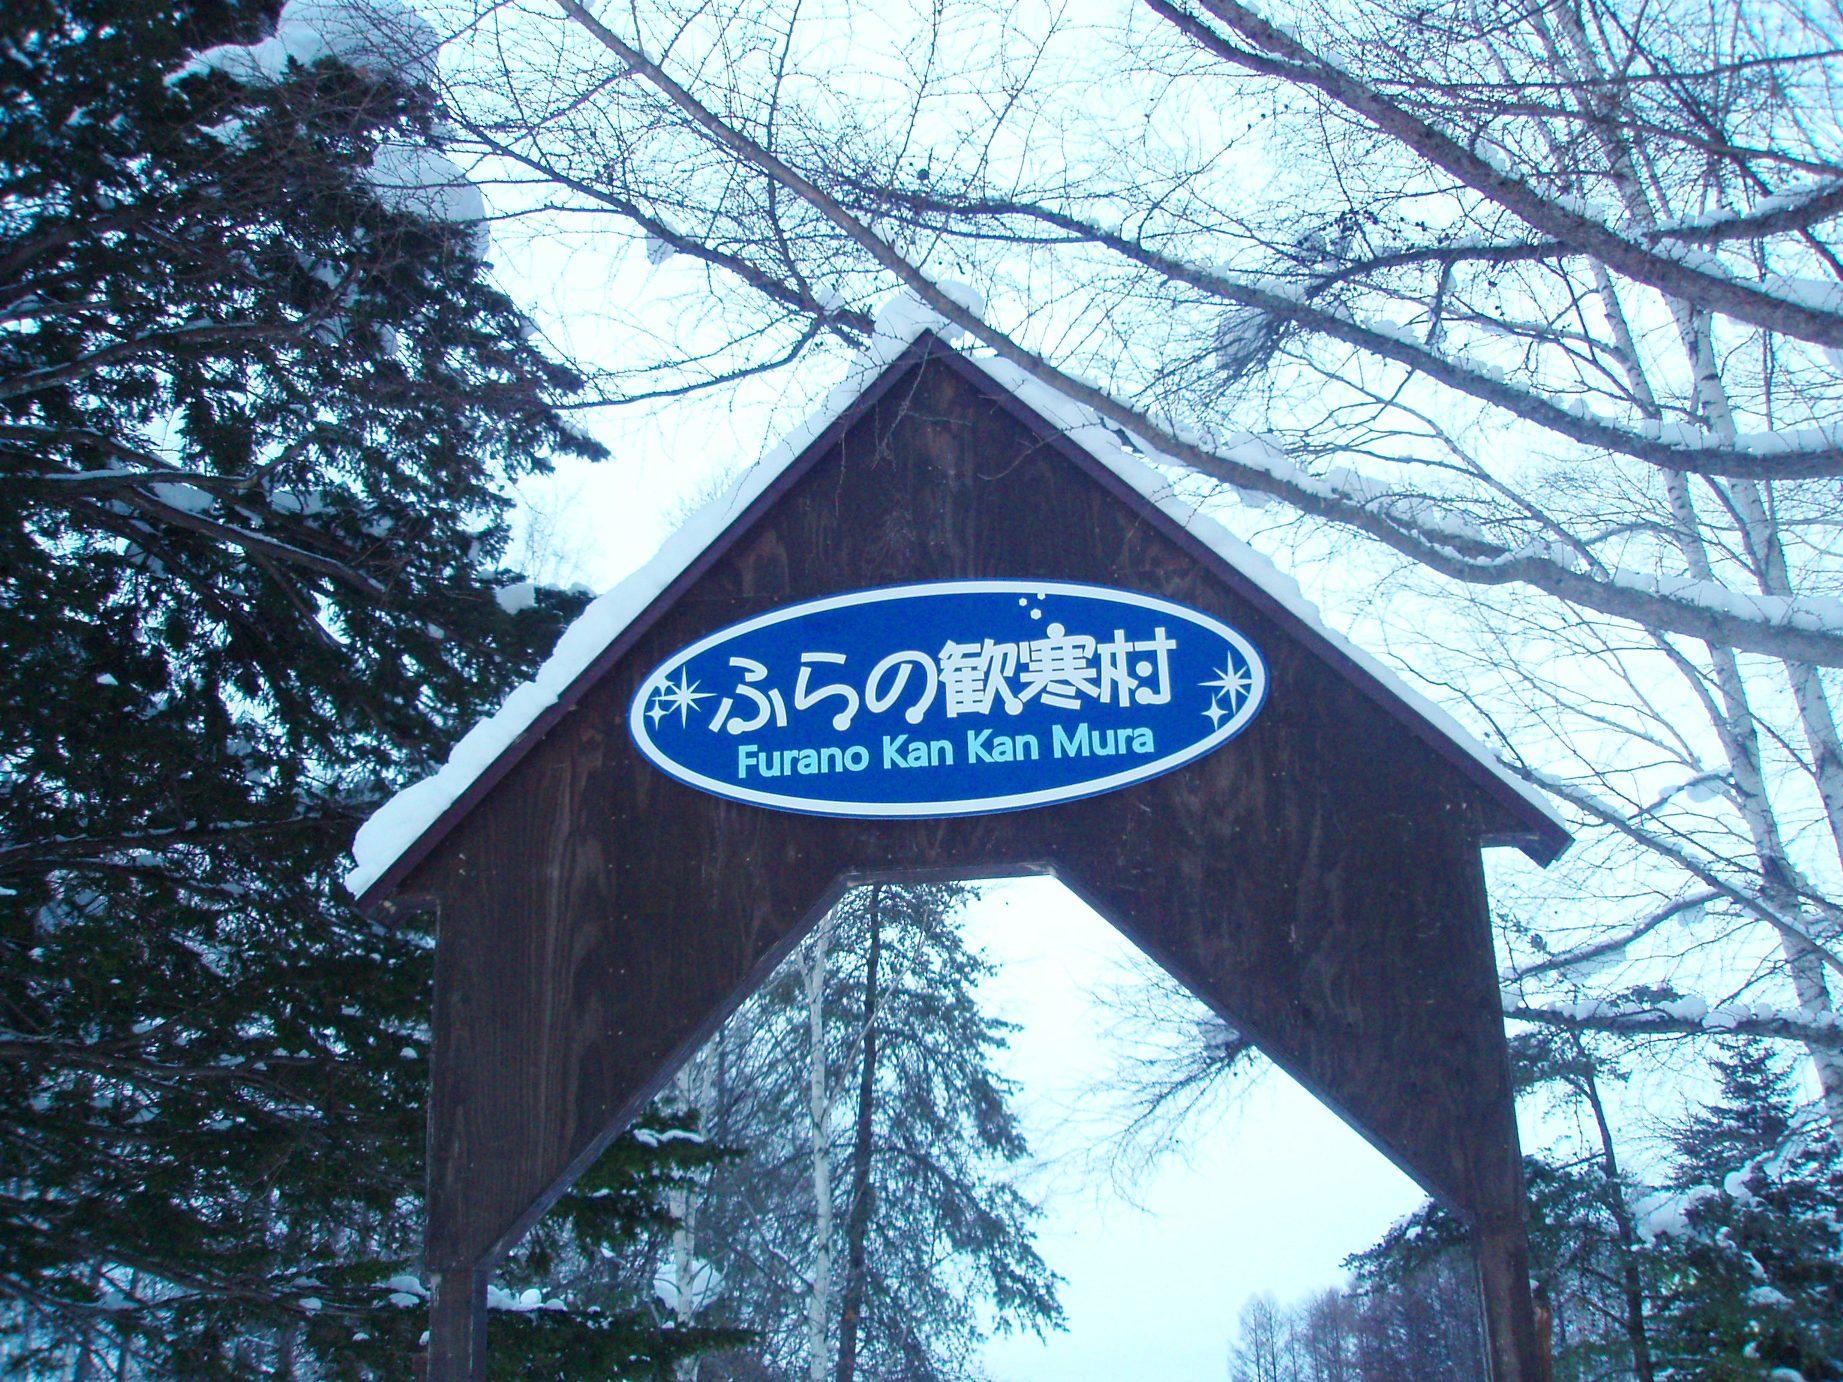 http://blog.princehotels.co.jp/ski/furano/2011.12.22.1.JPG